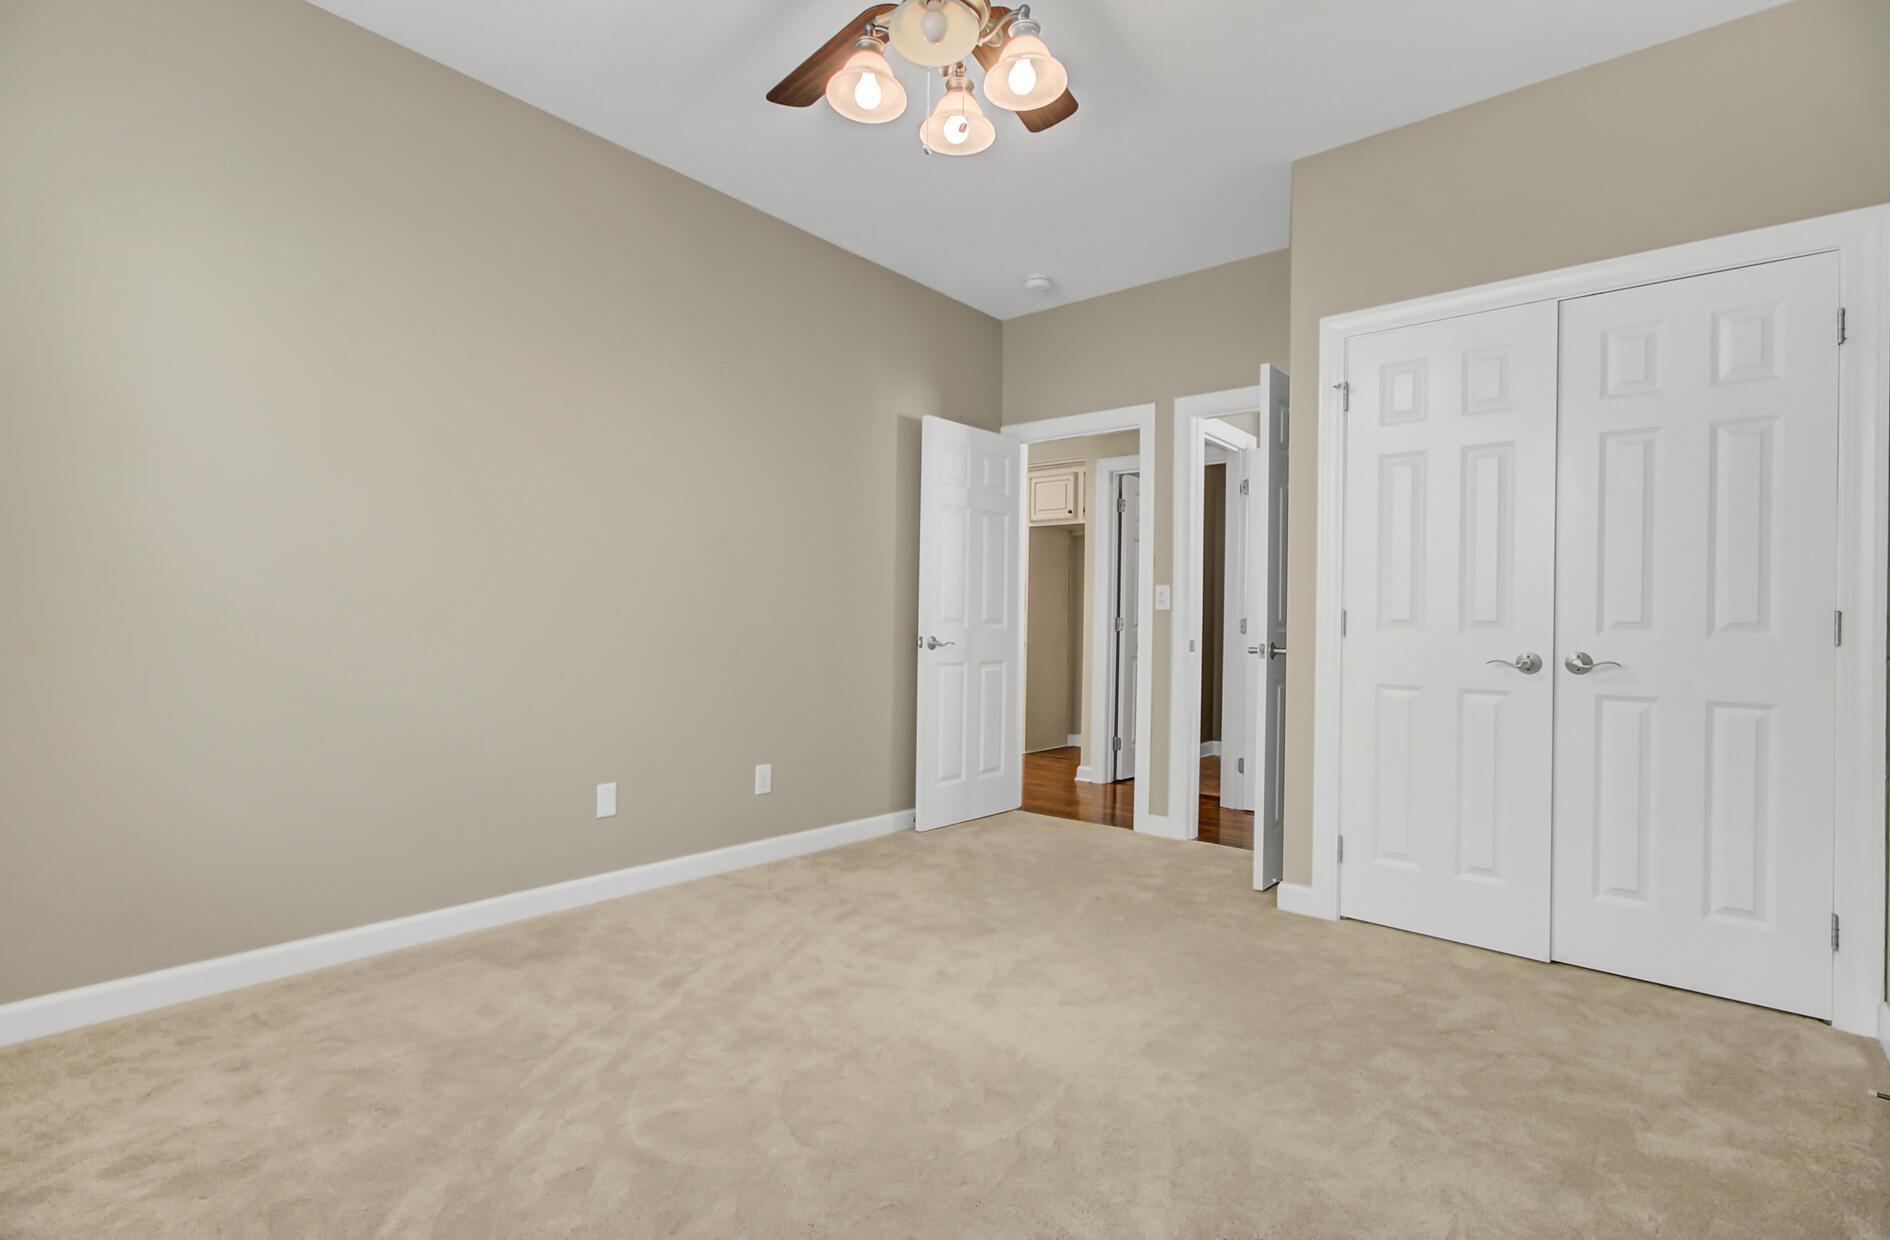 Marsh Cove Homes For Sale - 2928 Riverwood, Mount Pleasant, SC - 25